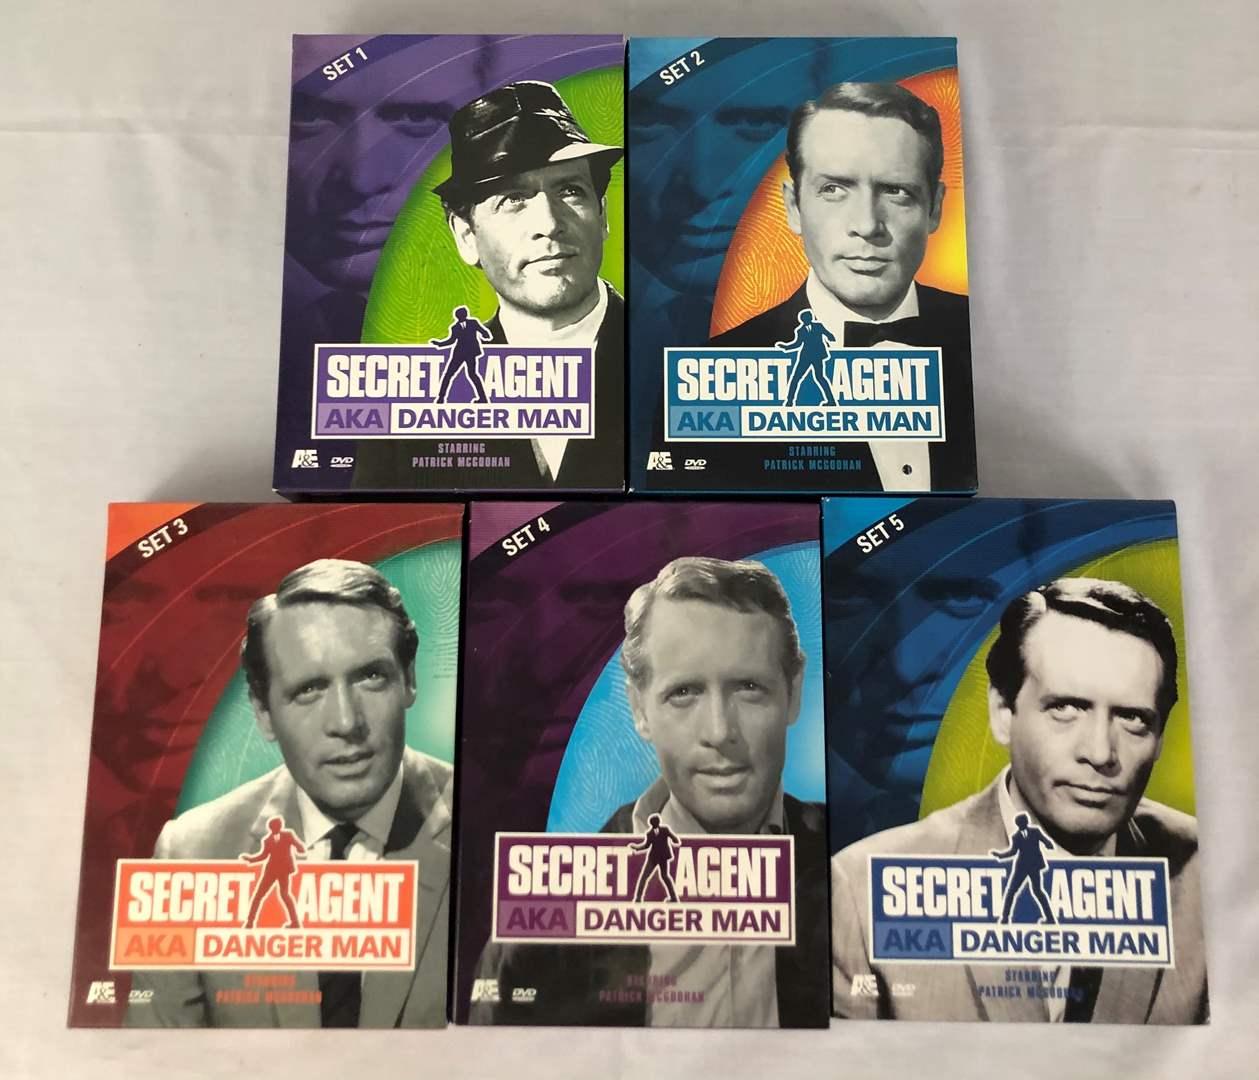 Lot # 60 - Secret Agent aka Danger Man DVD Set 1 - 5 (main image)